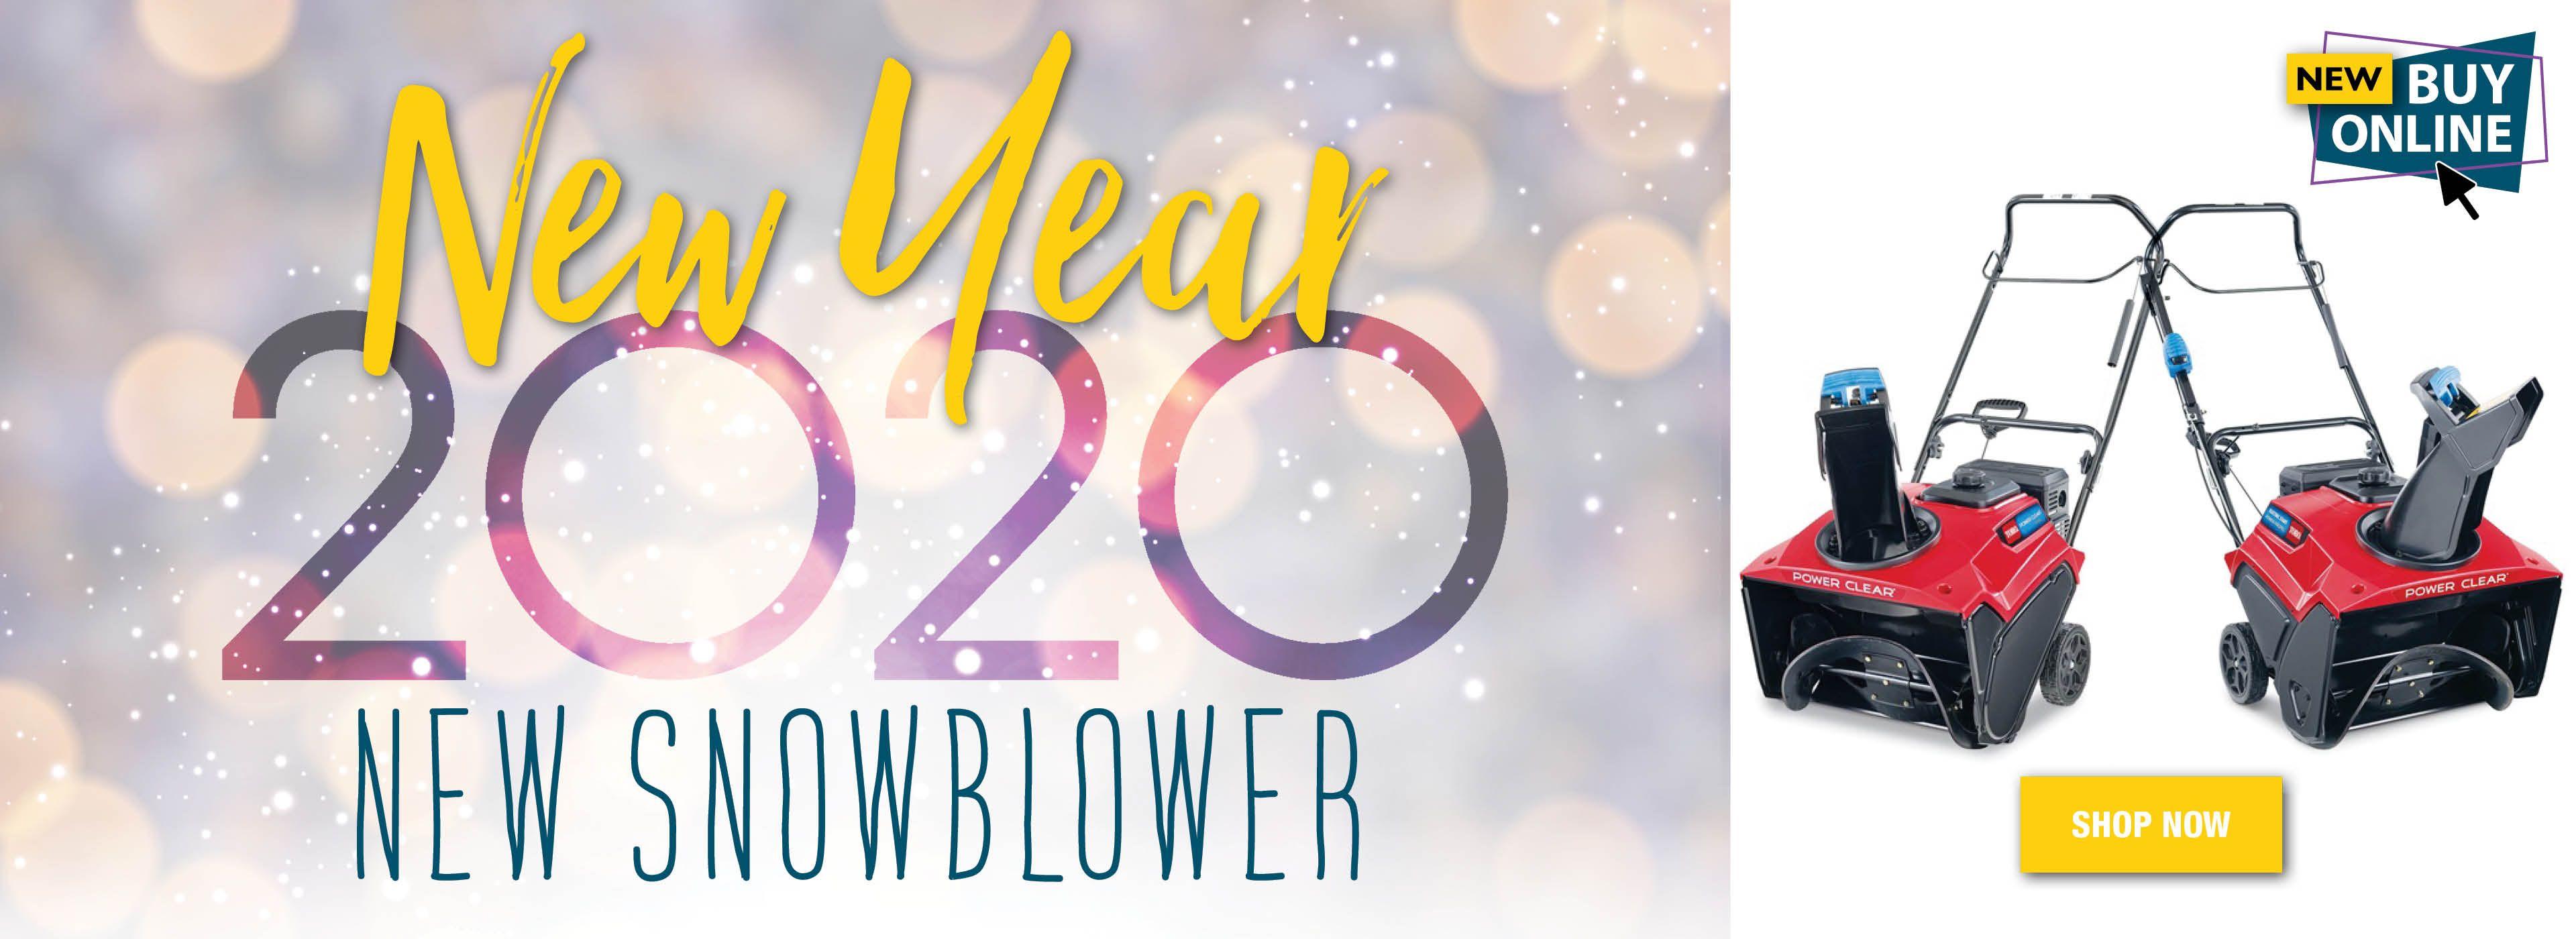 New Year New Snowblower 2020